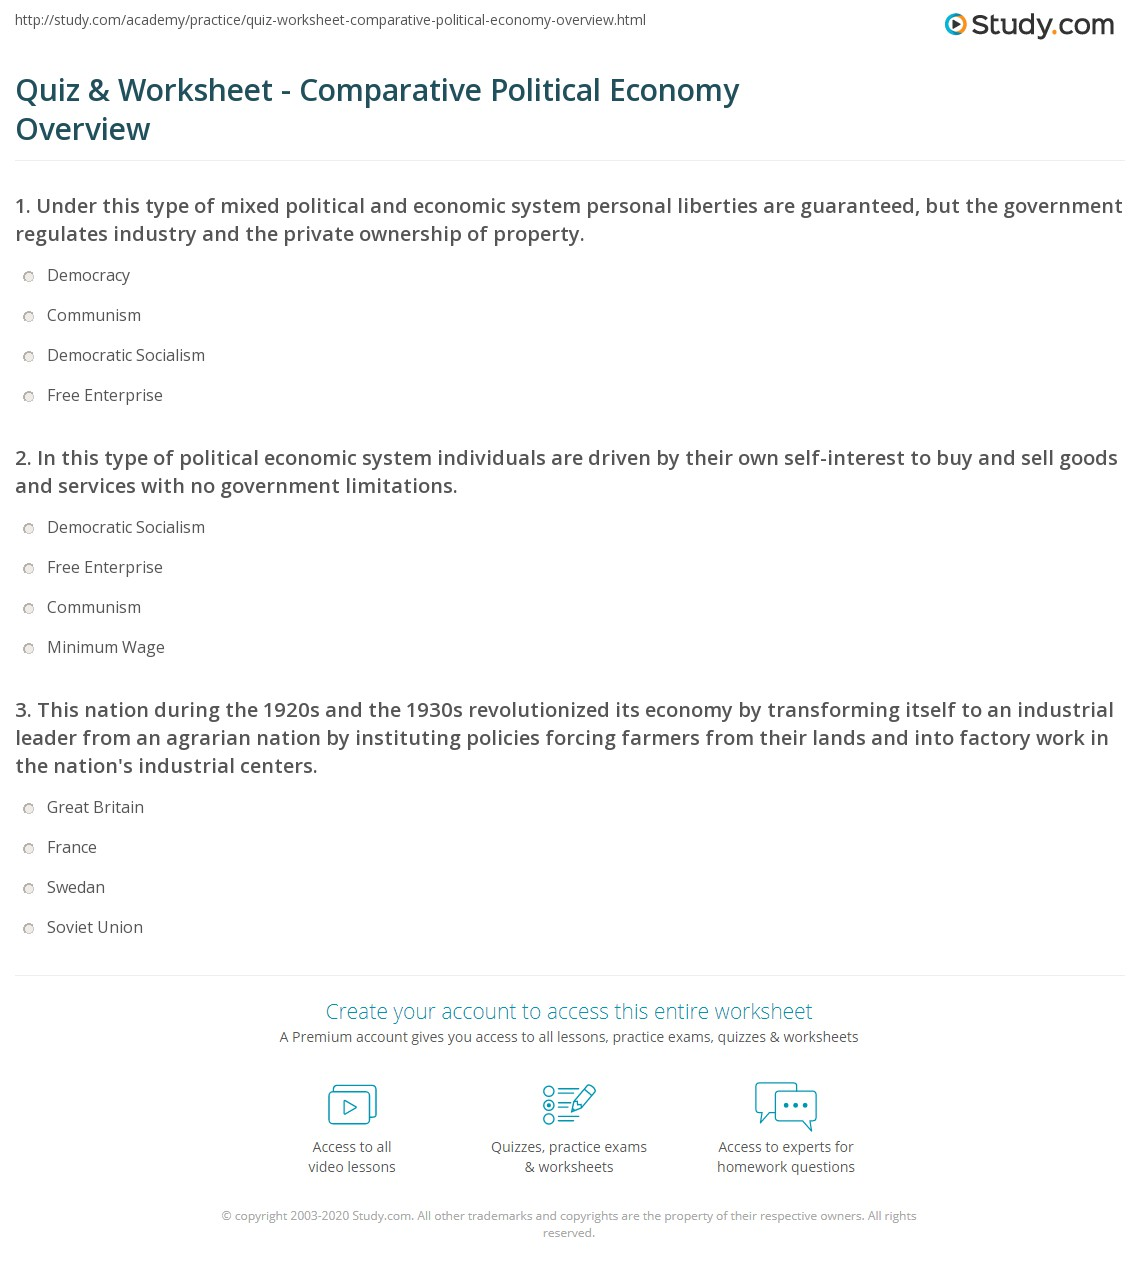 Quiz & Worksheet - Comparative Political Economy Overview   Study.com